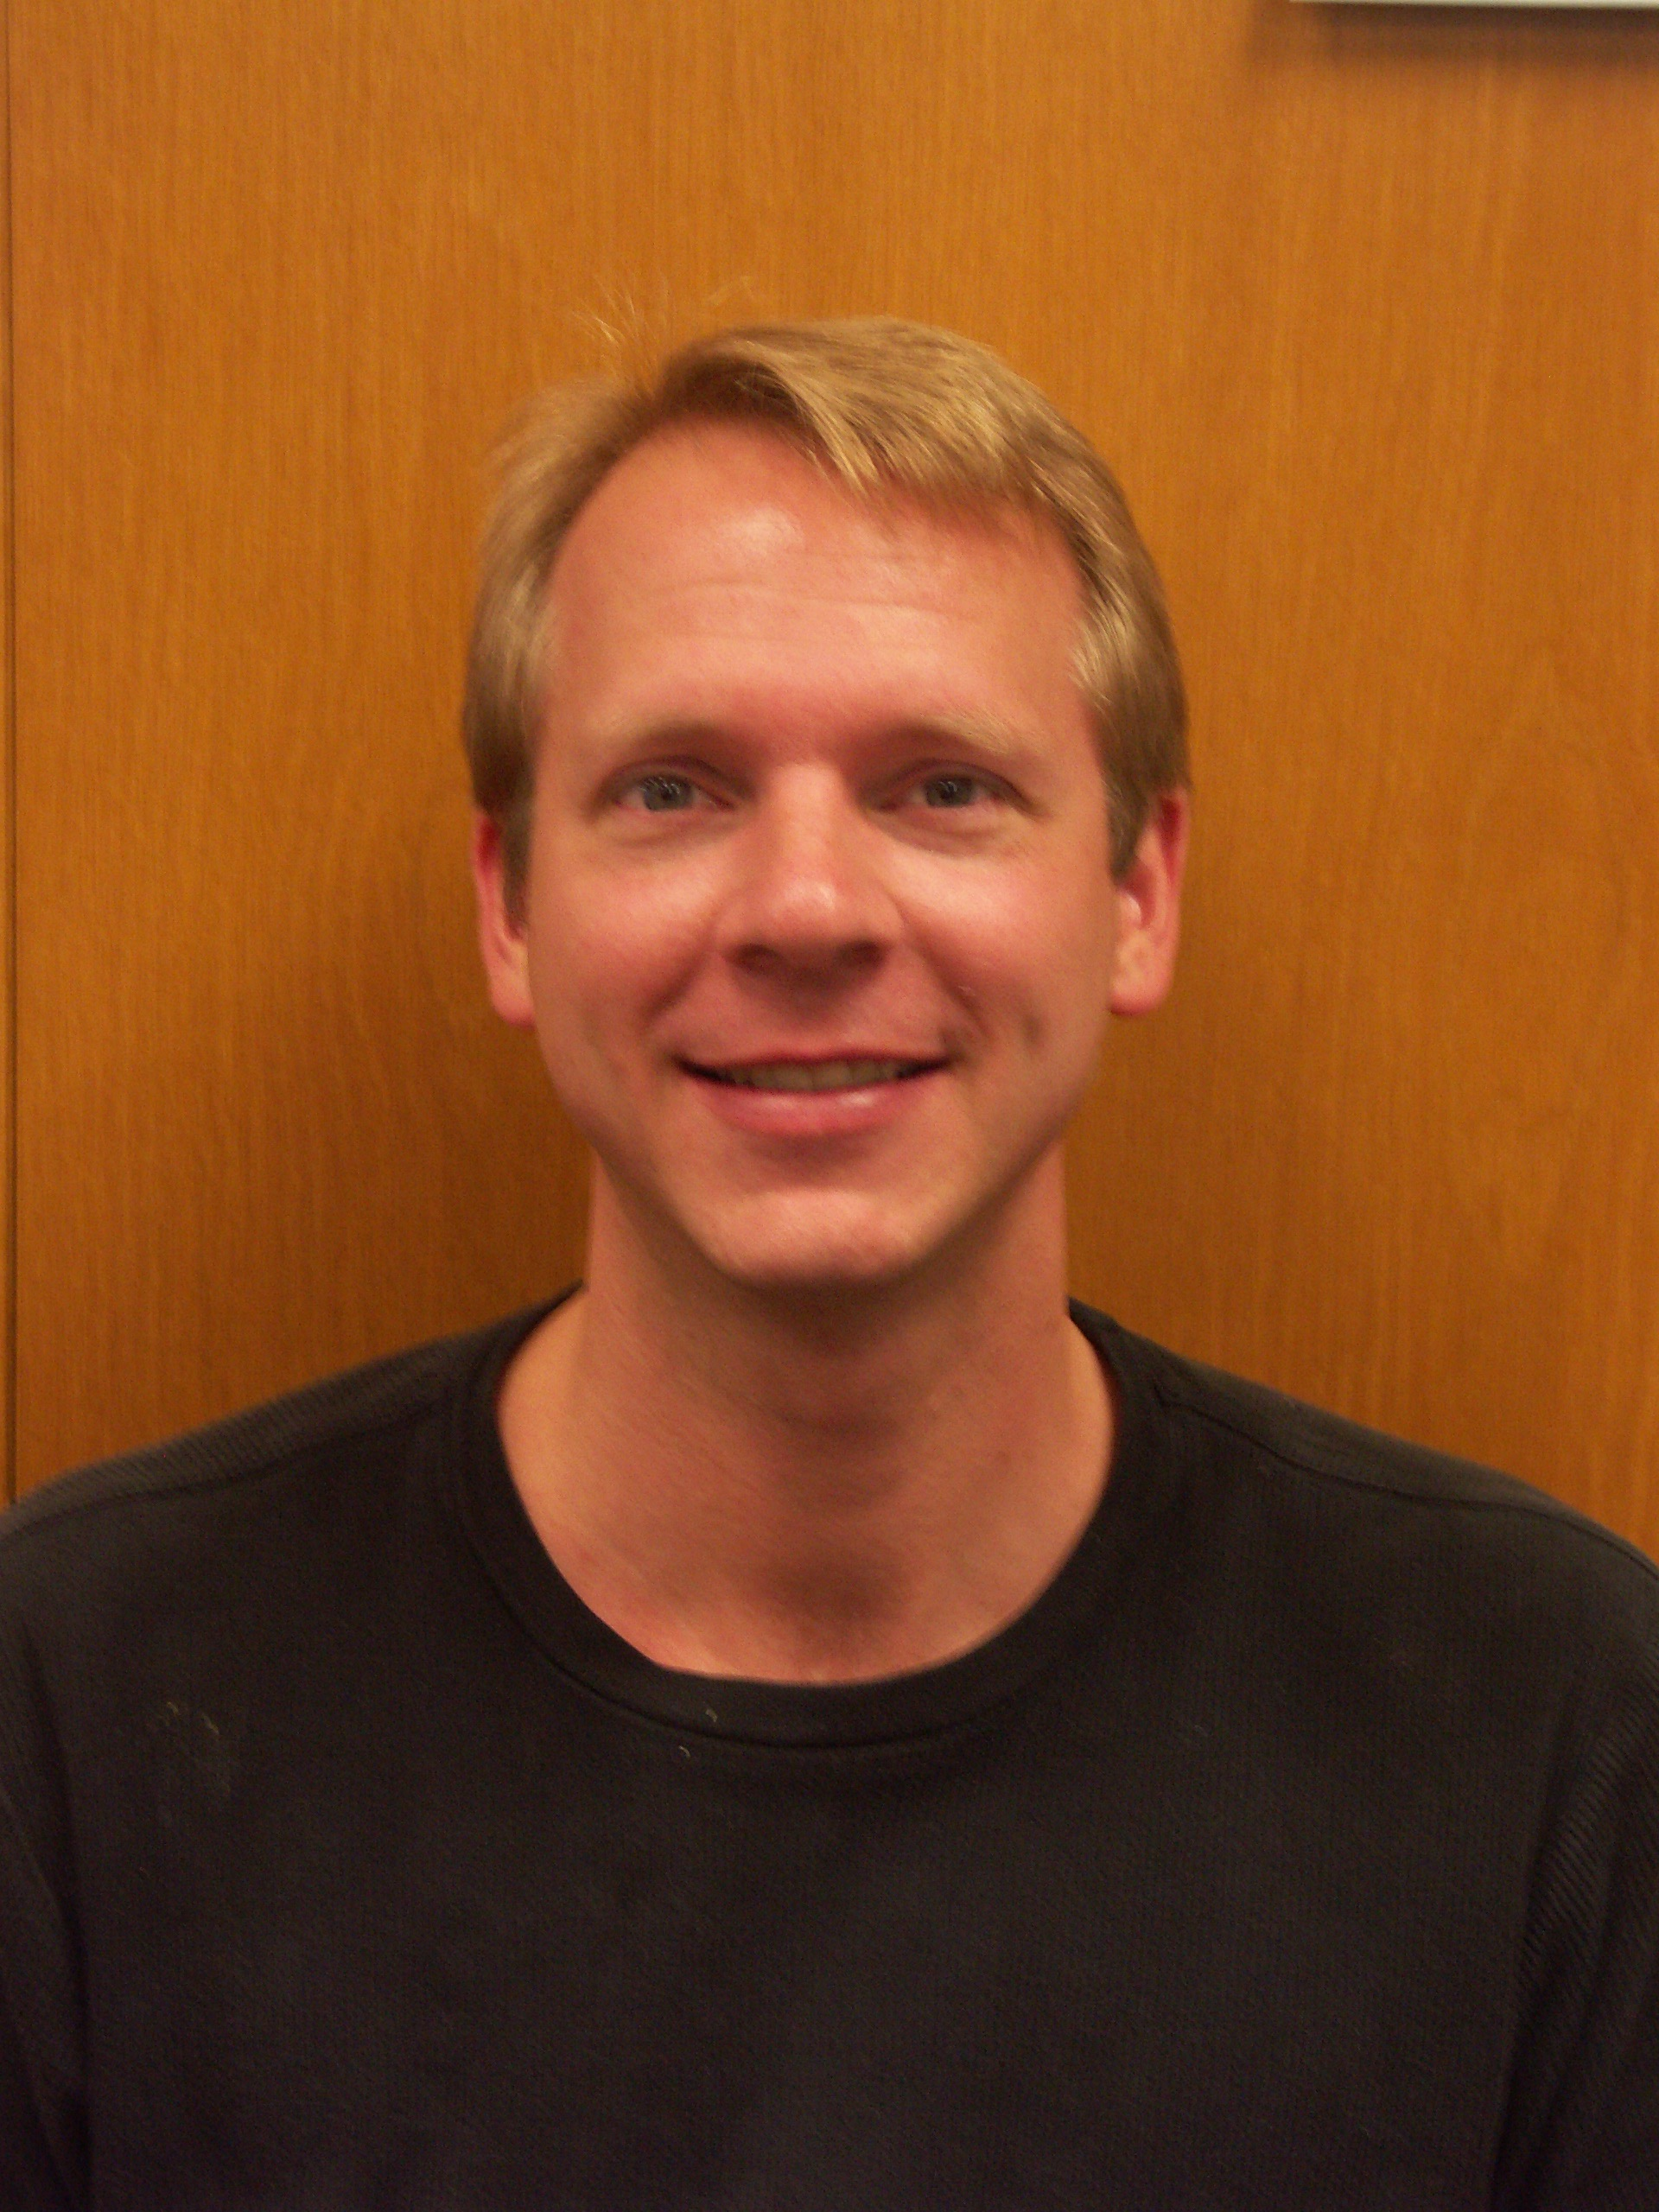 Picture of DO-IT Staff member Scott Bellman